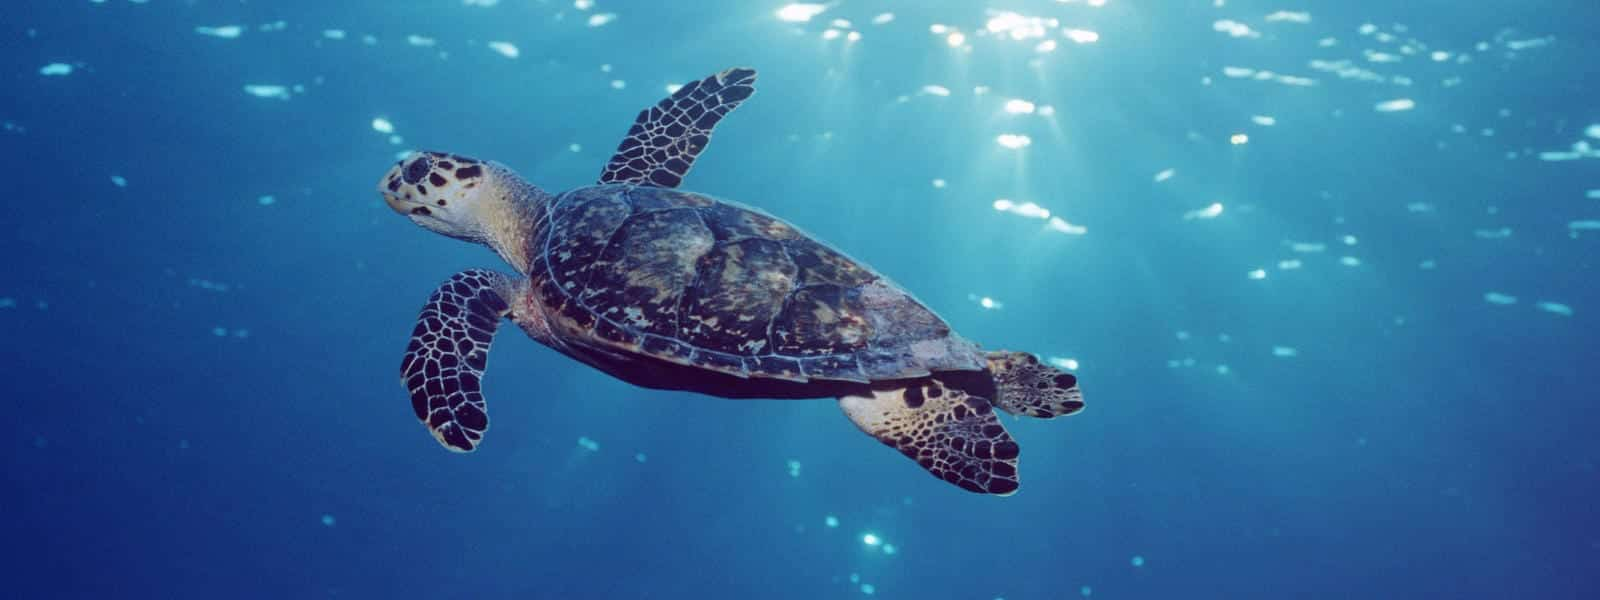 Tartarugas marinhas - características típicas das espécies